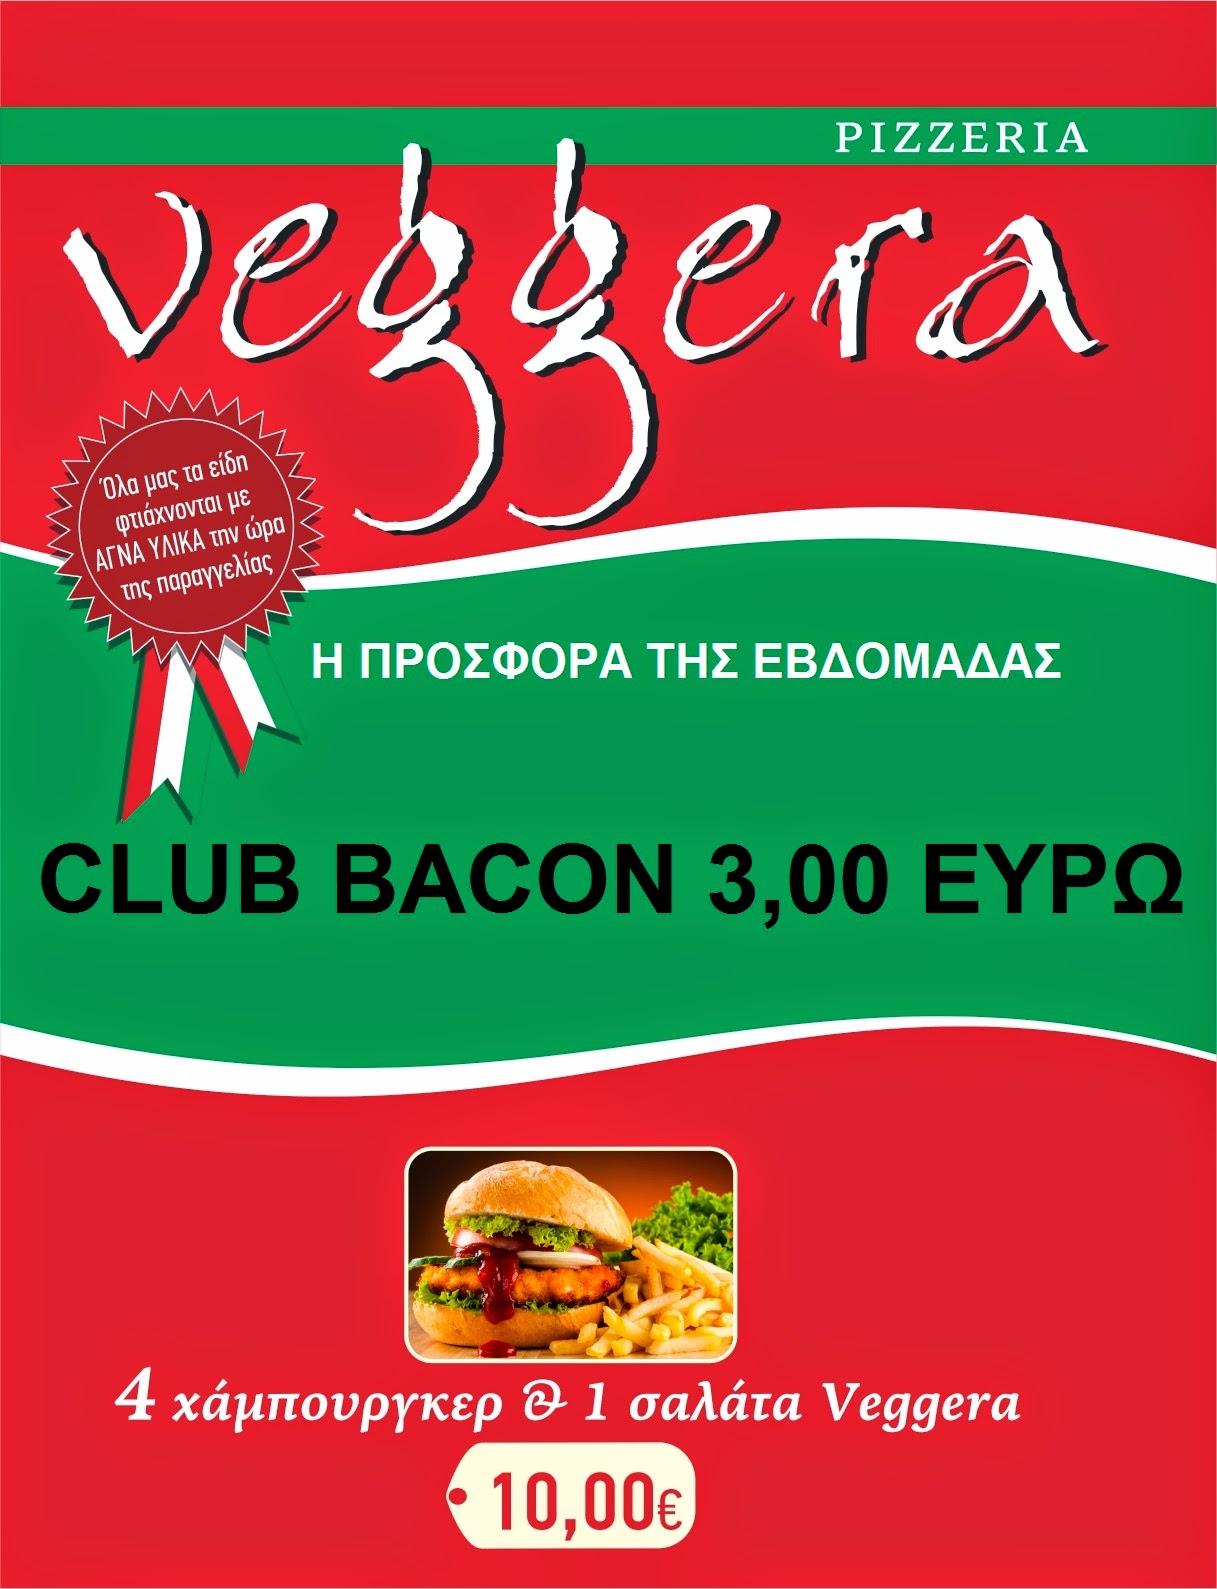 PIZZERIA VEGGERA:Η ΘΡΥΛΙΚΗ ΠΡΟΣΦΟΡΑ  ΕΒΔΟΜΑΔΑΣ ΕΠΑΝΑΛΑΜΒΑΝΕΤΑΙ: CLUB BACON    3,00 ΕΥΡΩ !